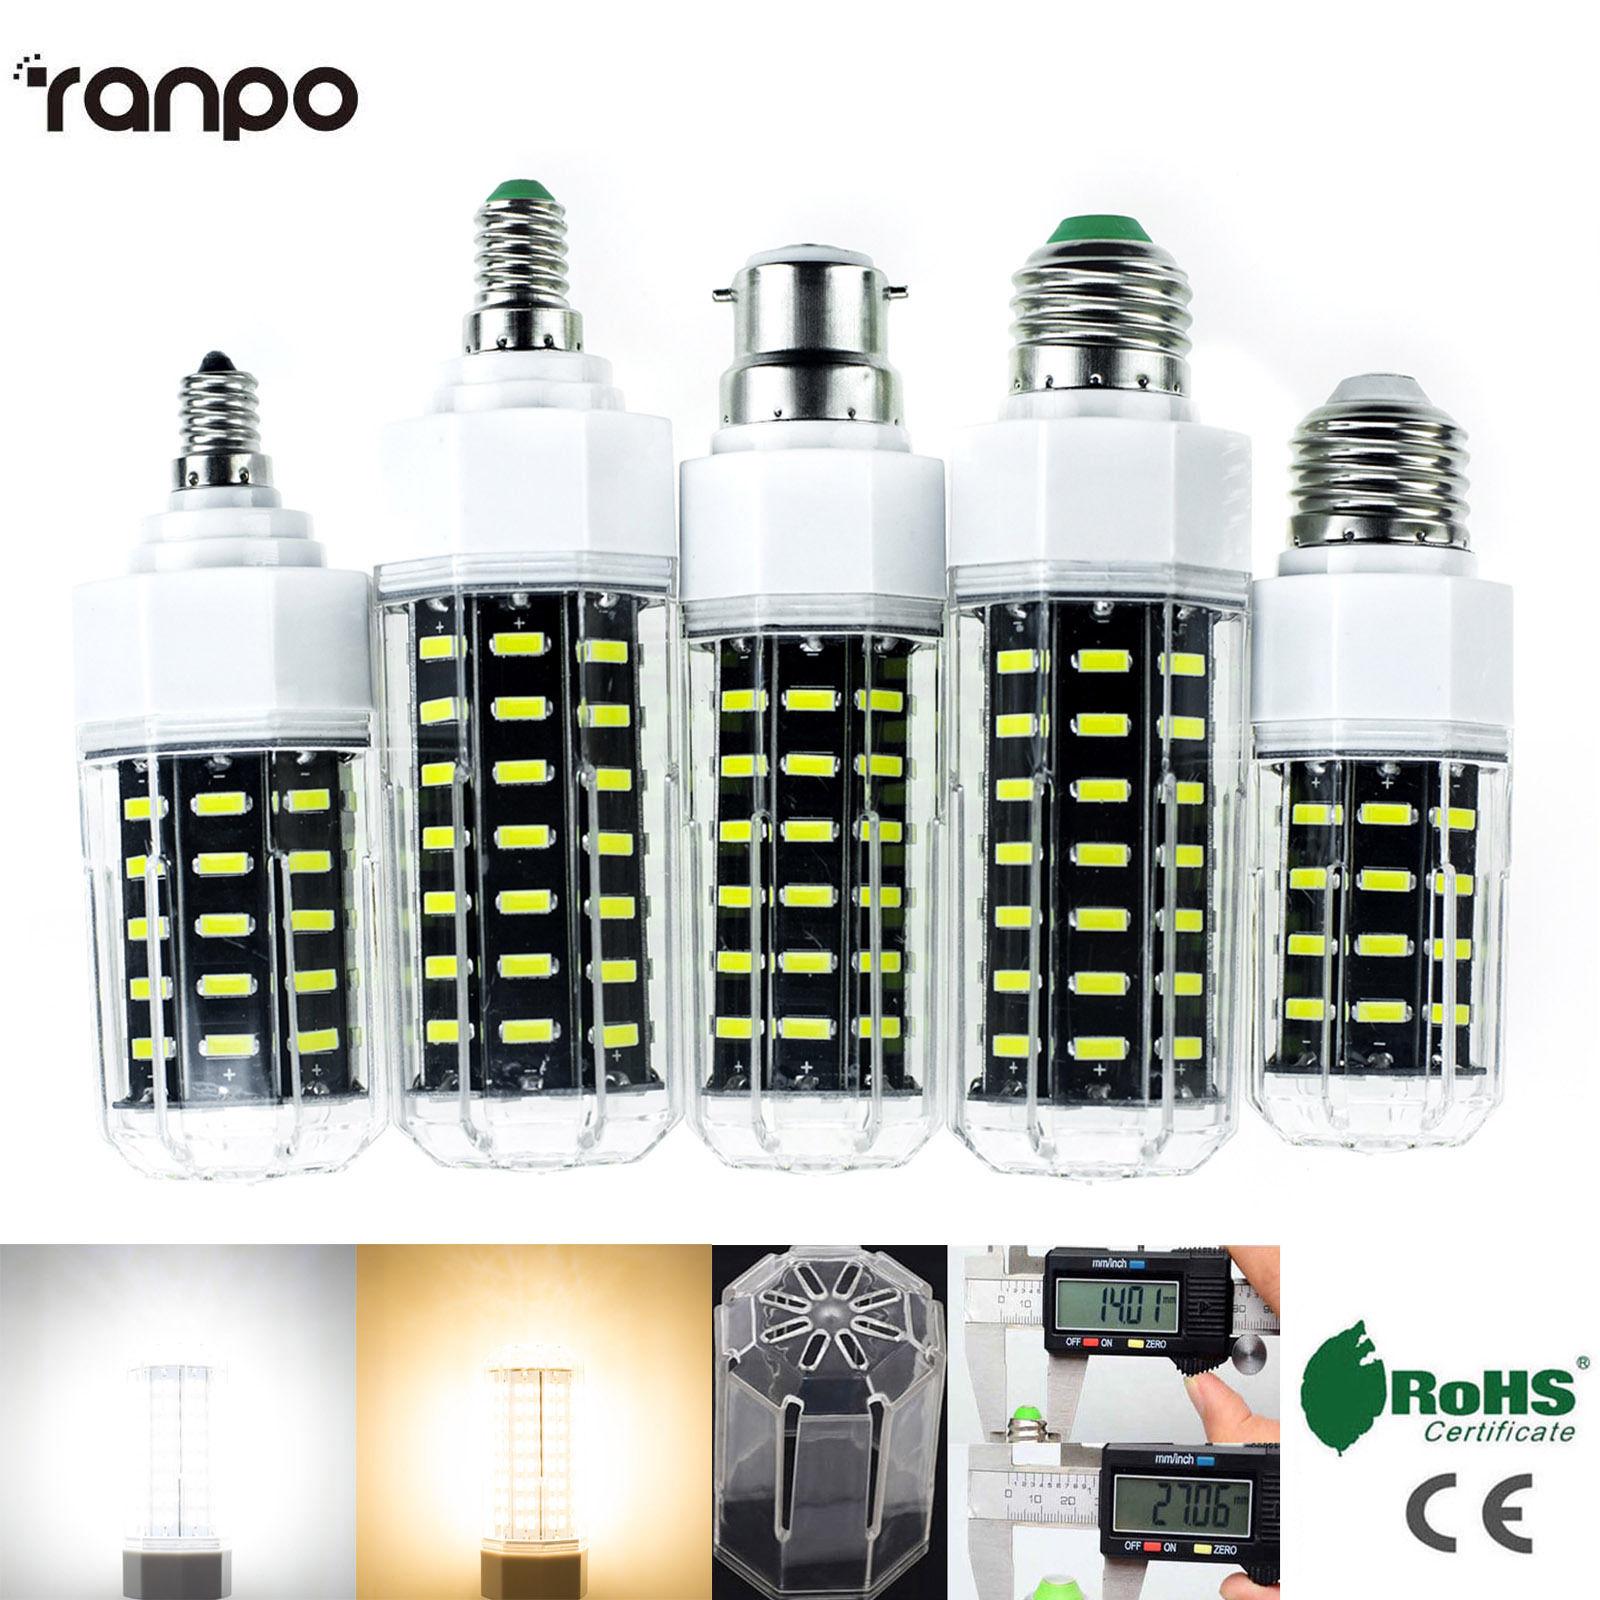 E27 E26 E12 E14 Dimmable LED Corn Bulb 7030 SMD Light 22W 27W 30W 36W White Lamp